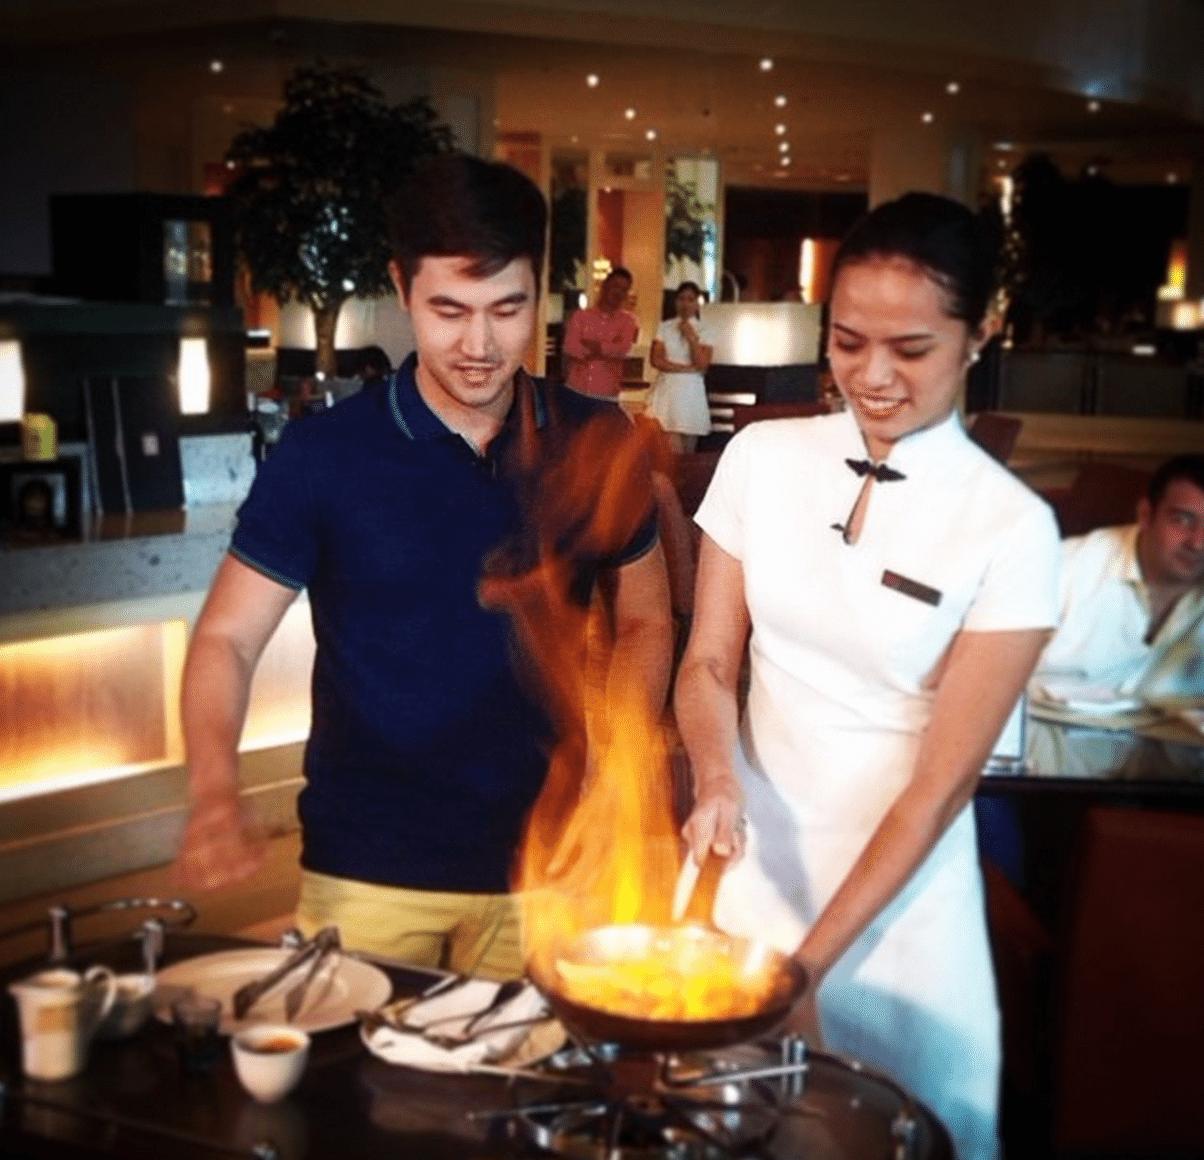 Steven Silva Chef Cooking